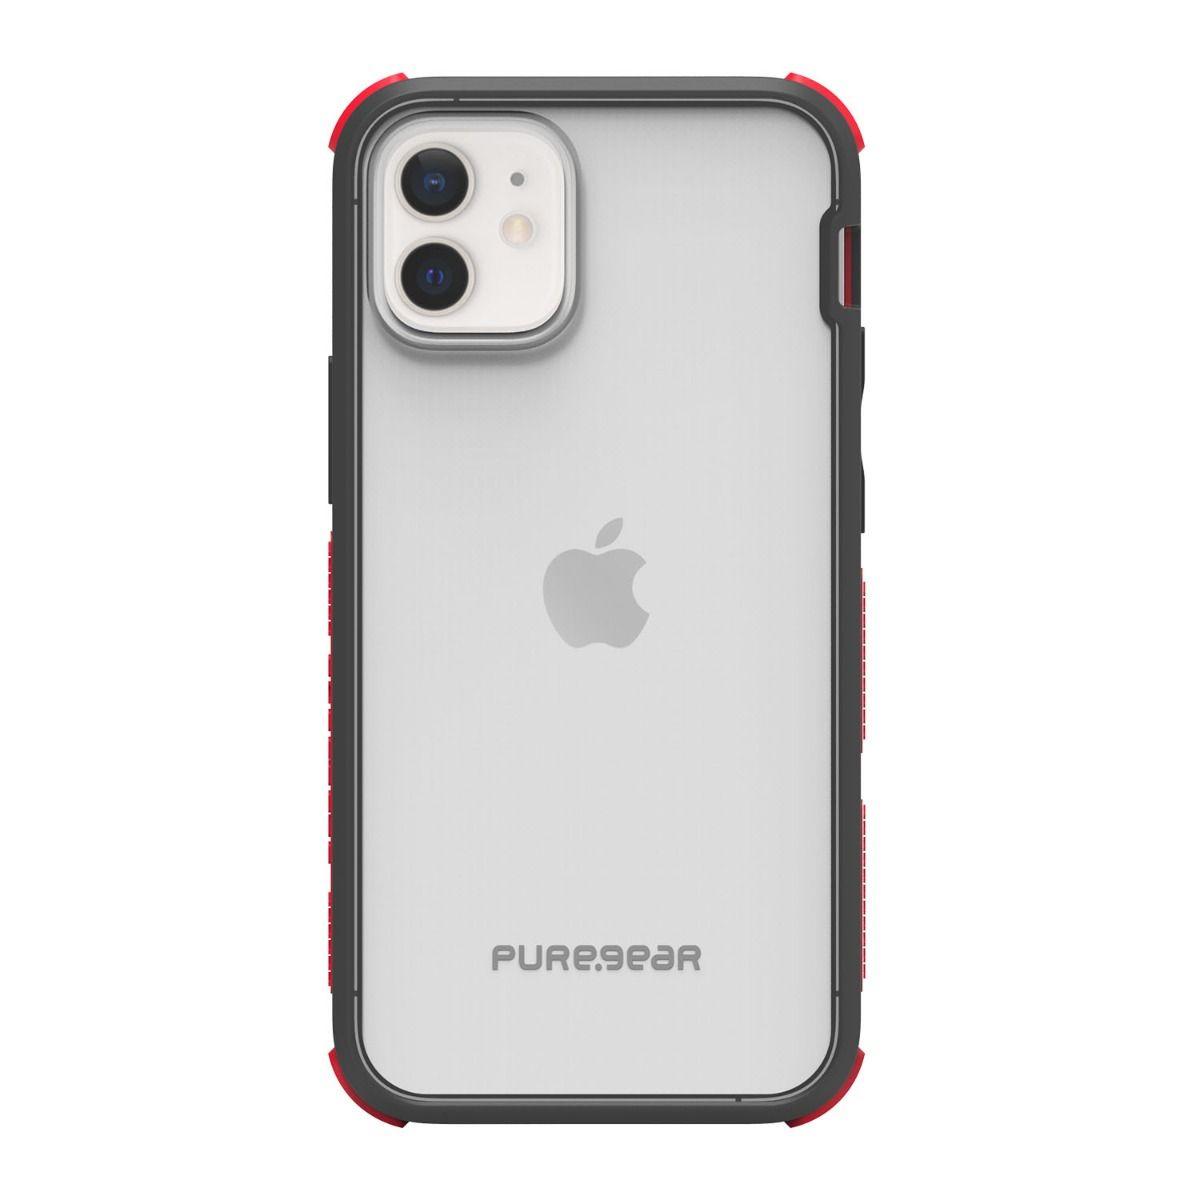 Apple iPhone 12 mini DualTek Clear - Black/Red